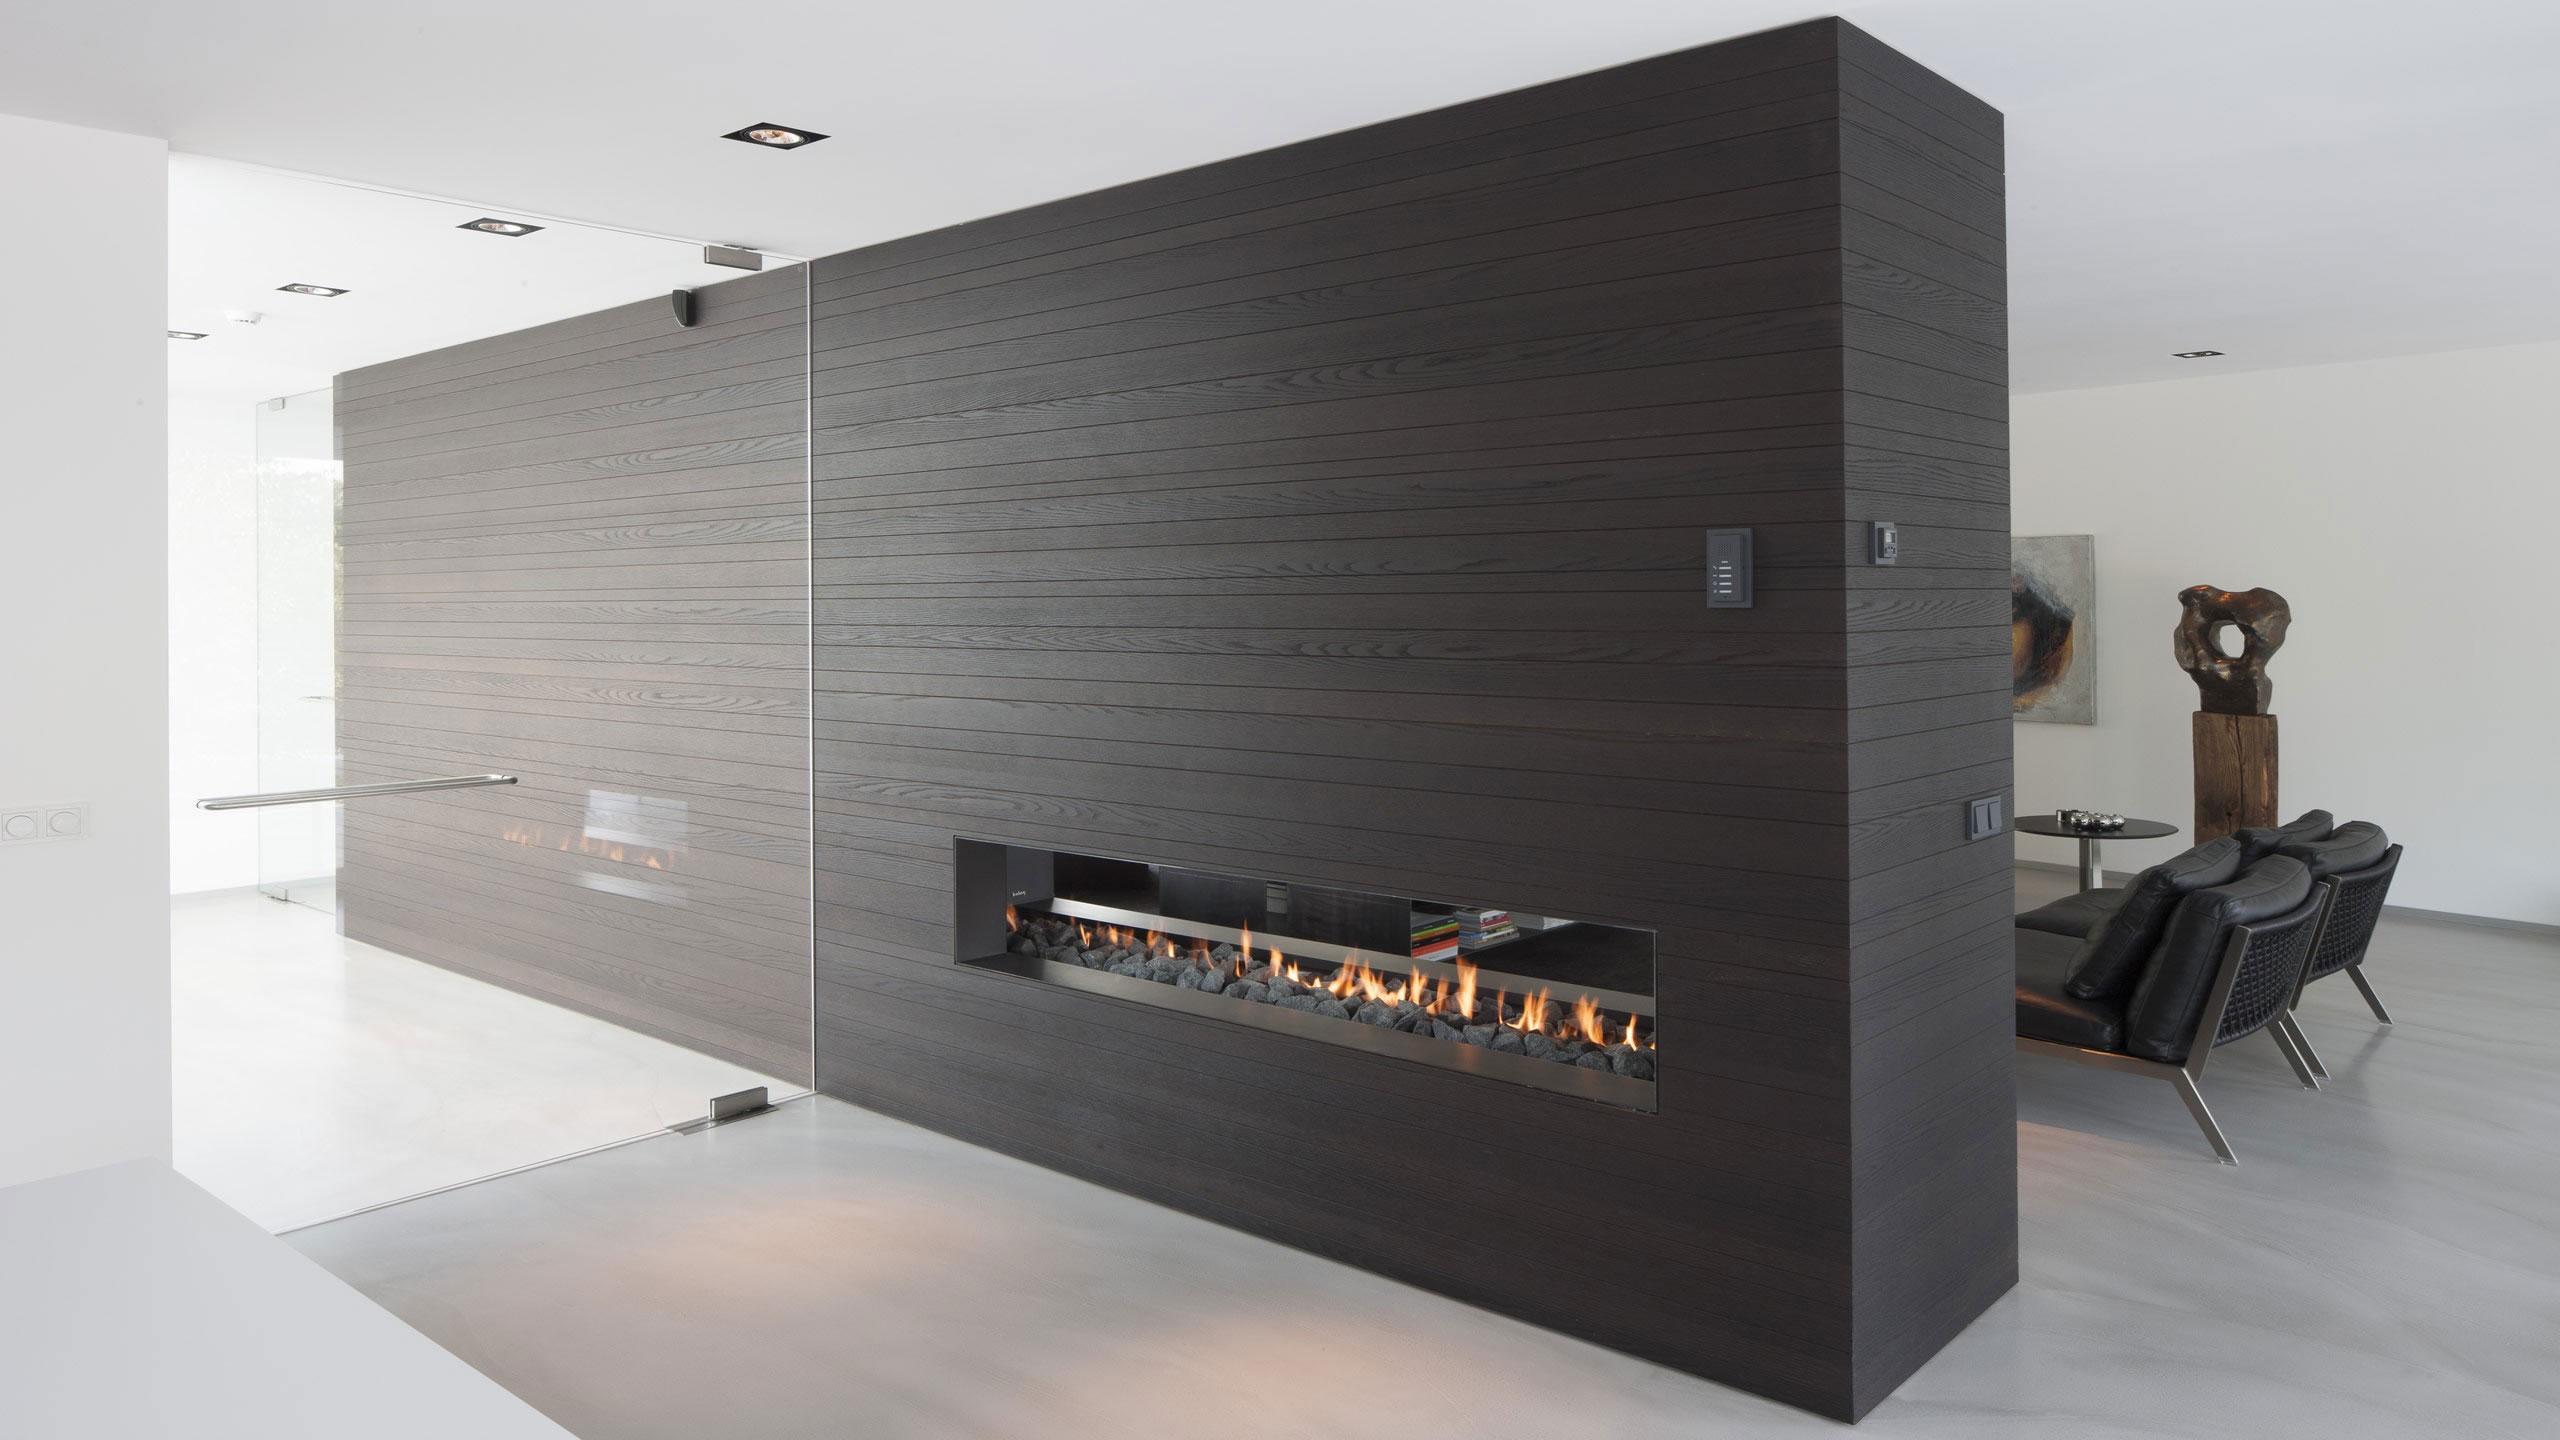 Boxed Villa Spee Haelen with Panoramic Windows by Lab32 architecten-13